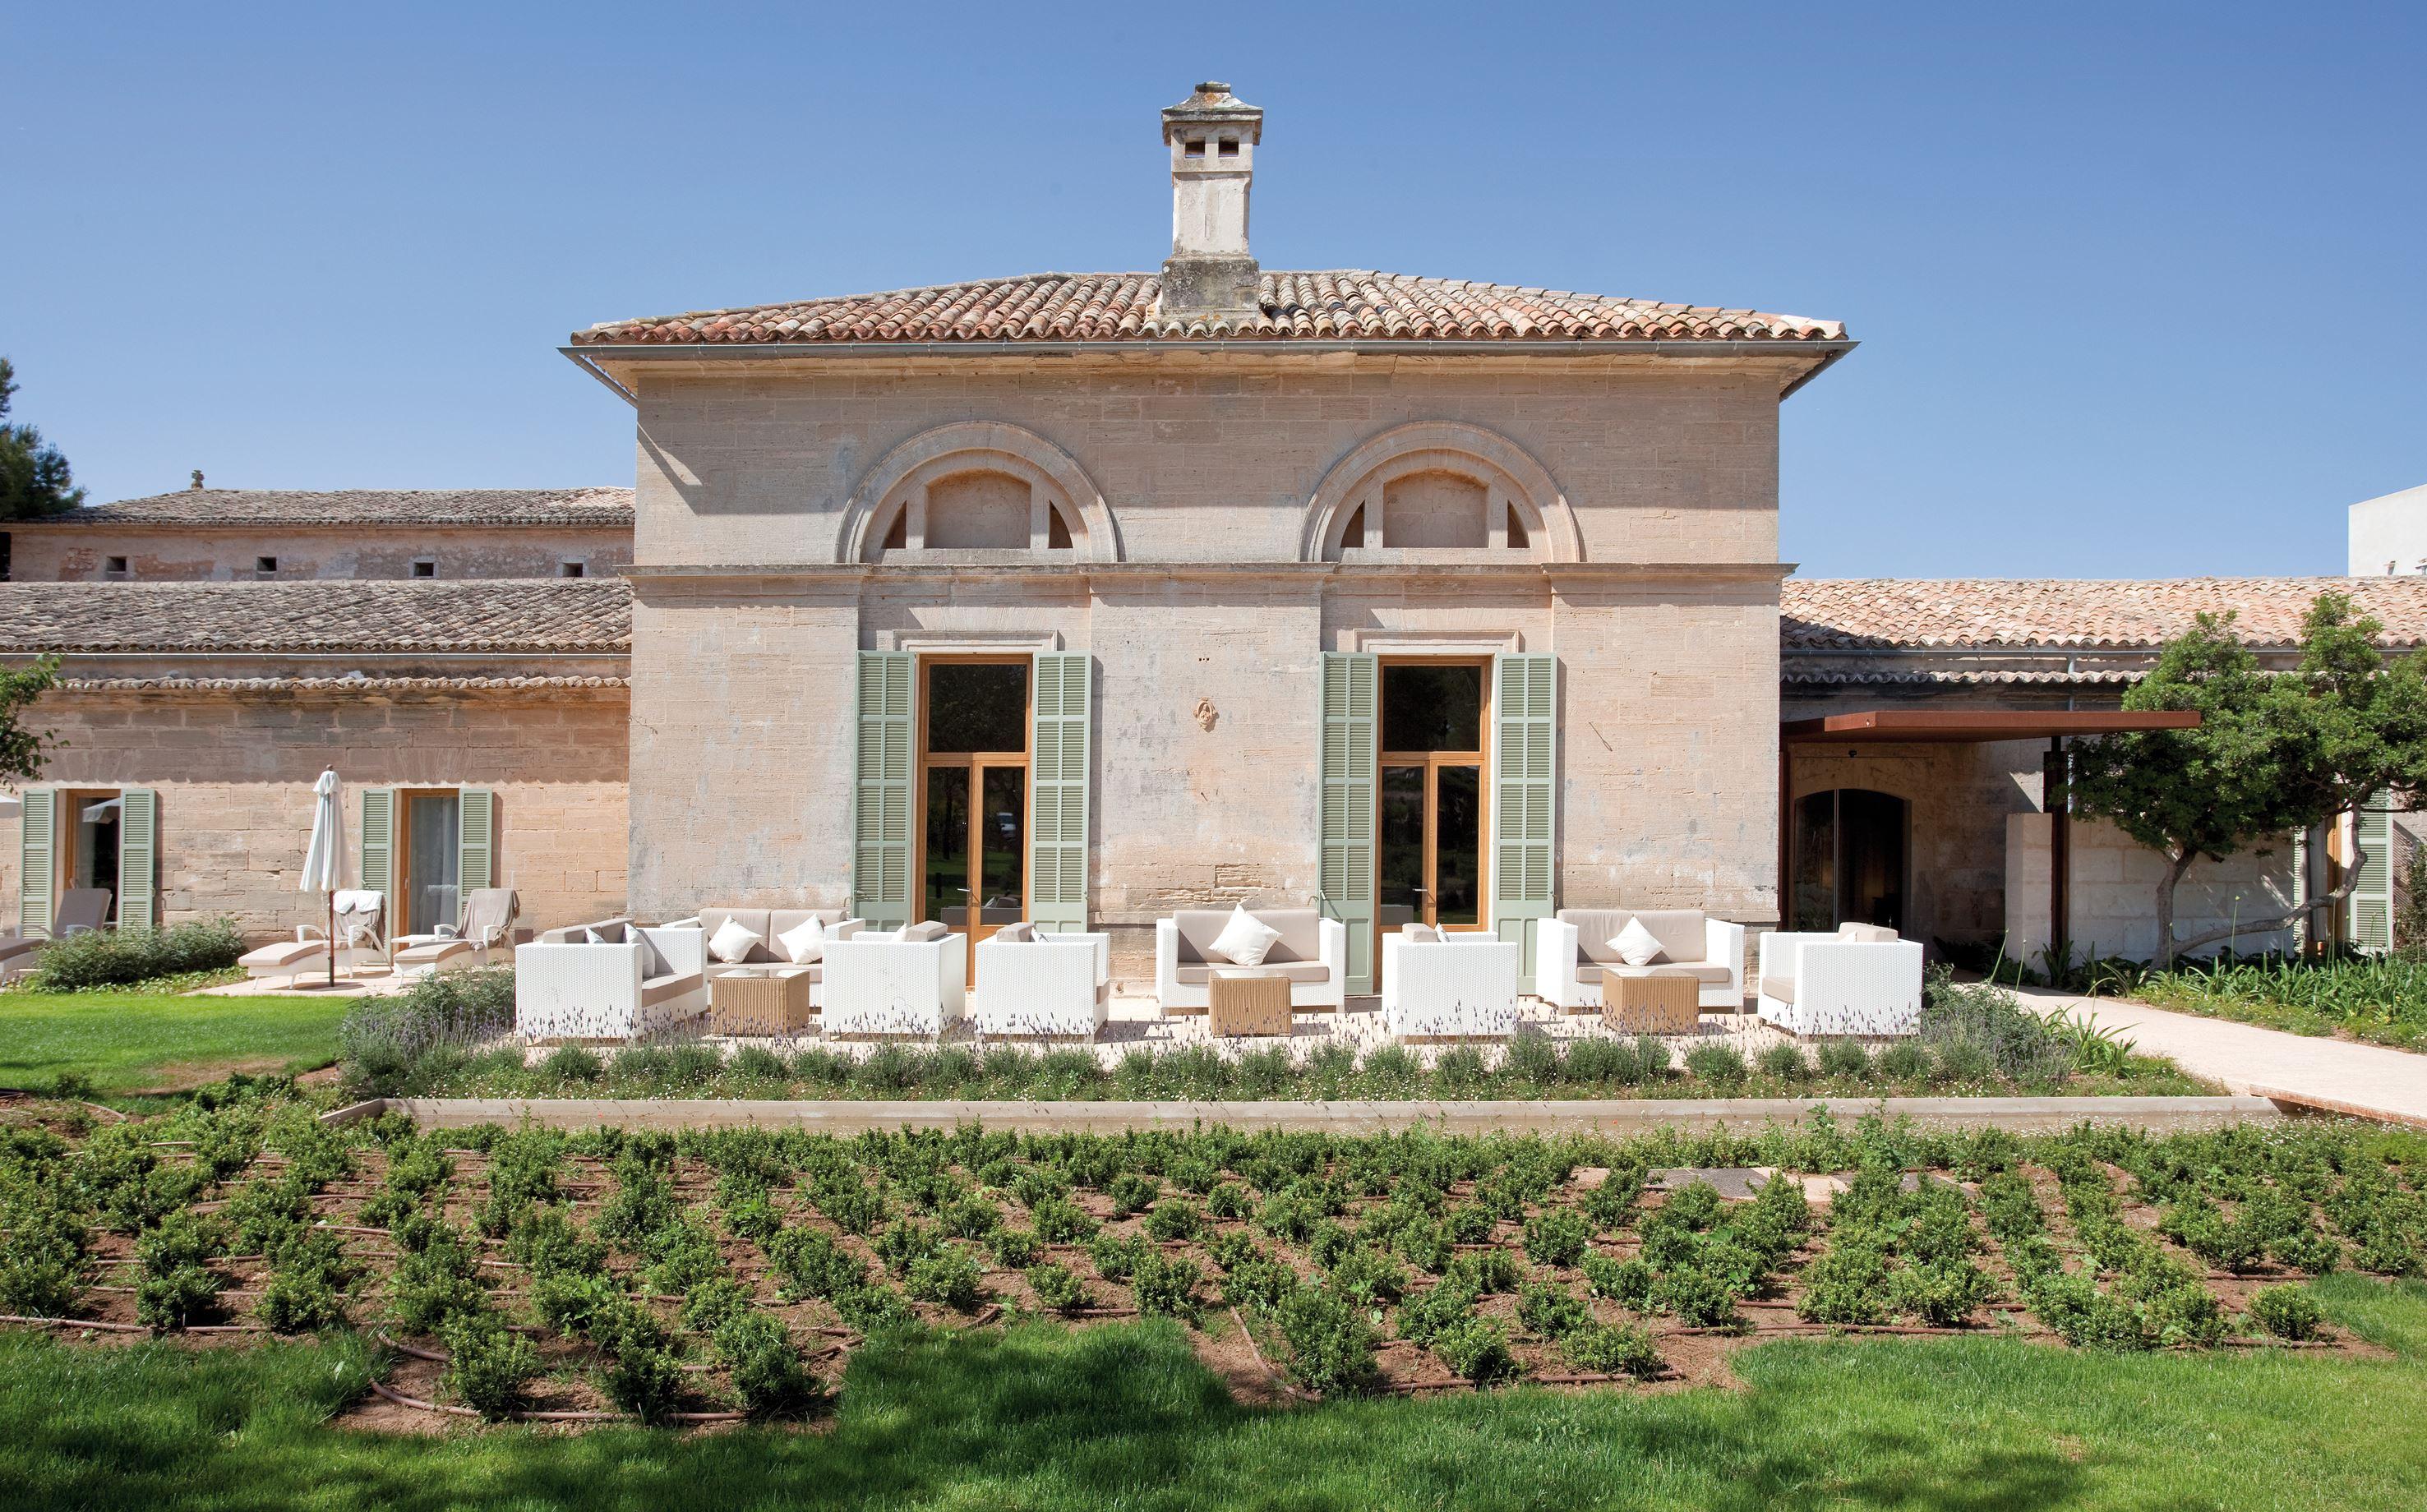 Fontsanta Hotel Thermal Spa & Wellness, Colonia de Sant Jordi Mallorca